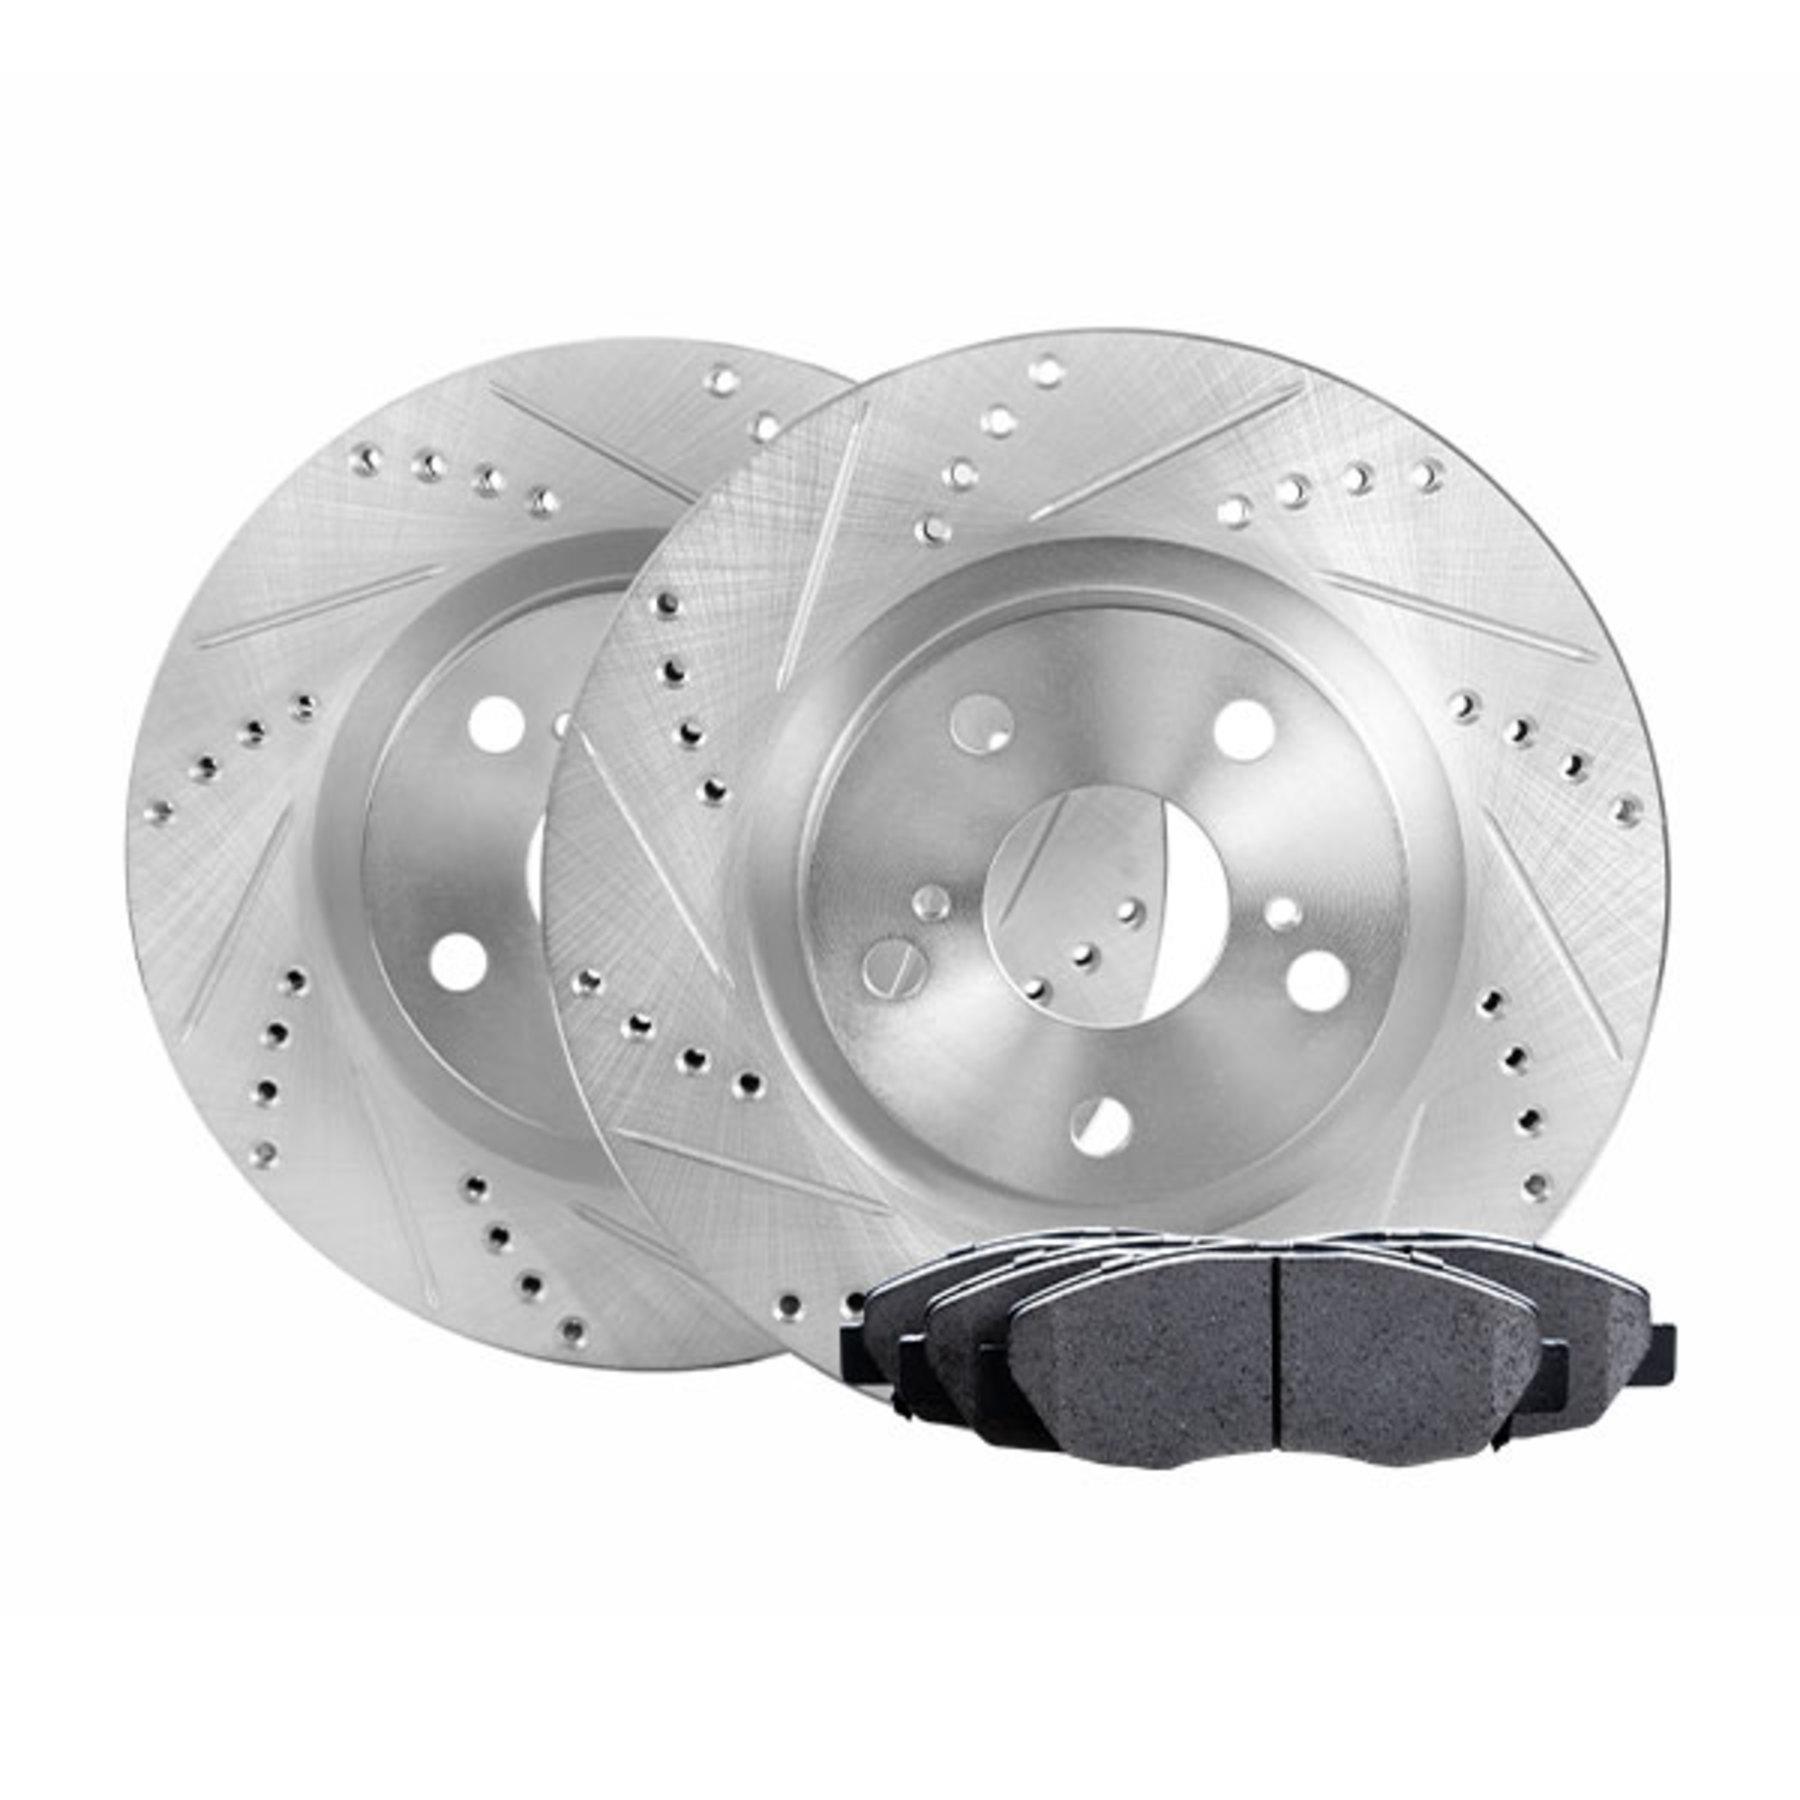 Full Kit Cross-Drilled Slotted Brake Rotors and Ceramic Brake Pads BLCC.63070.02